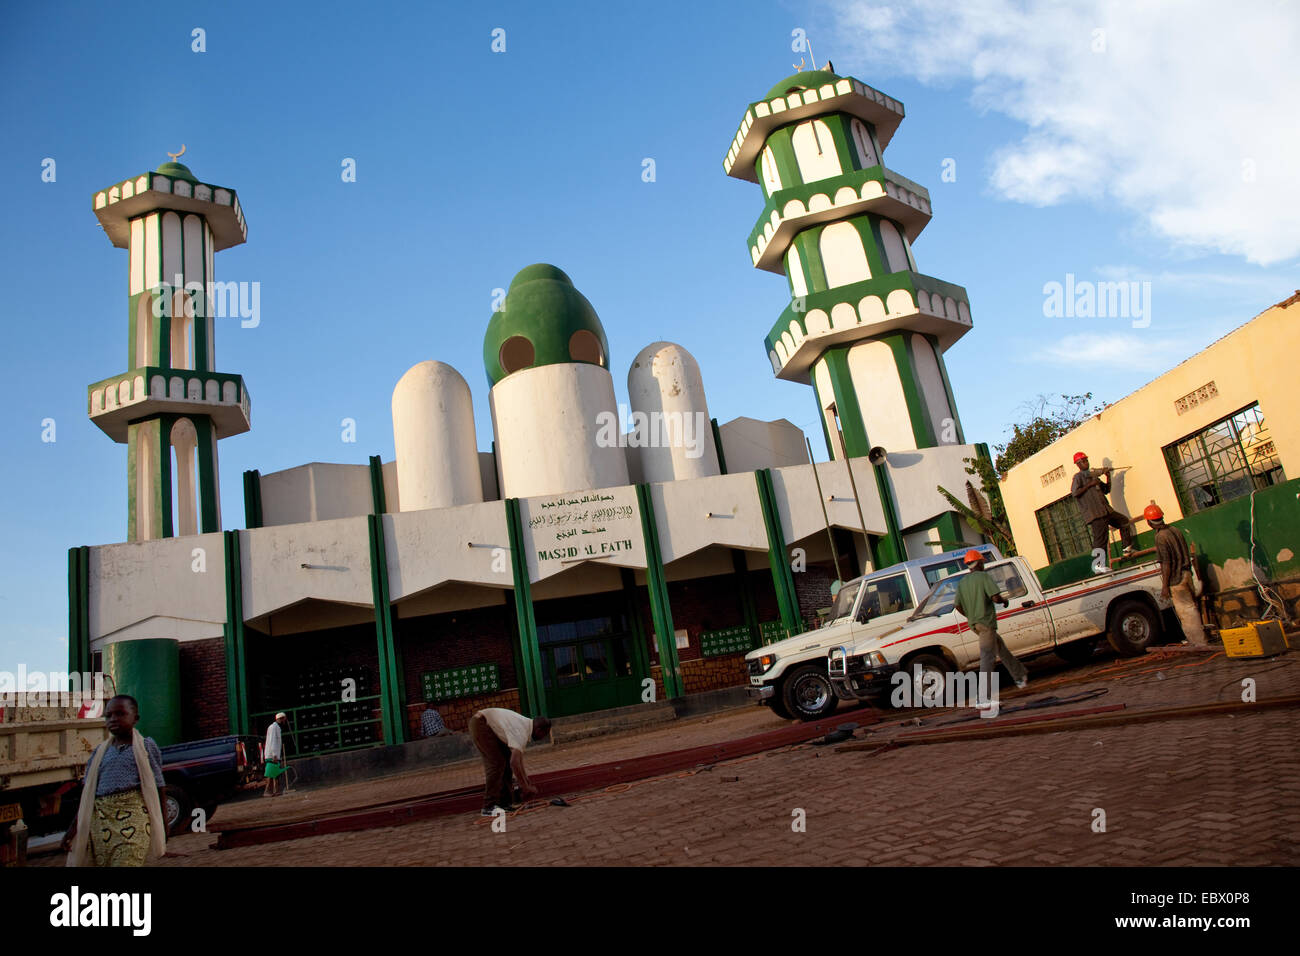 biggest Mosque of Nyamirambo, an area of Kigali where a larger number of Muslims live , Rwanda, Nyamirambo, Kigali - Stock Image